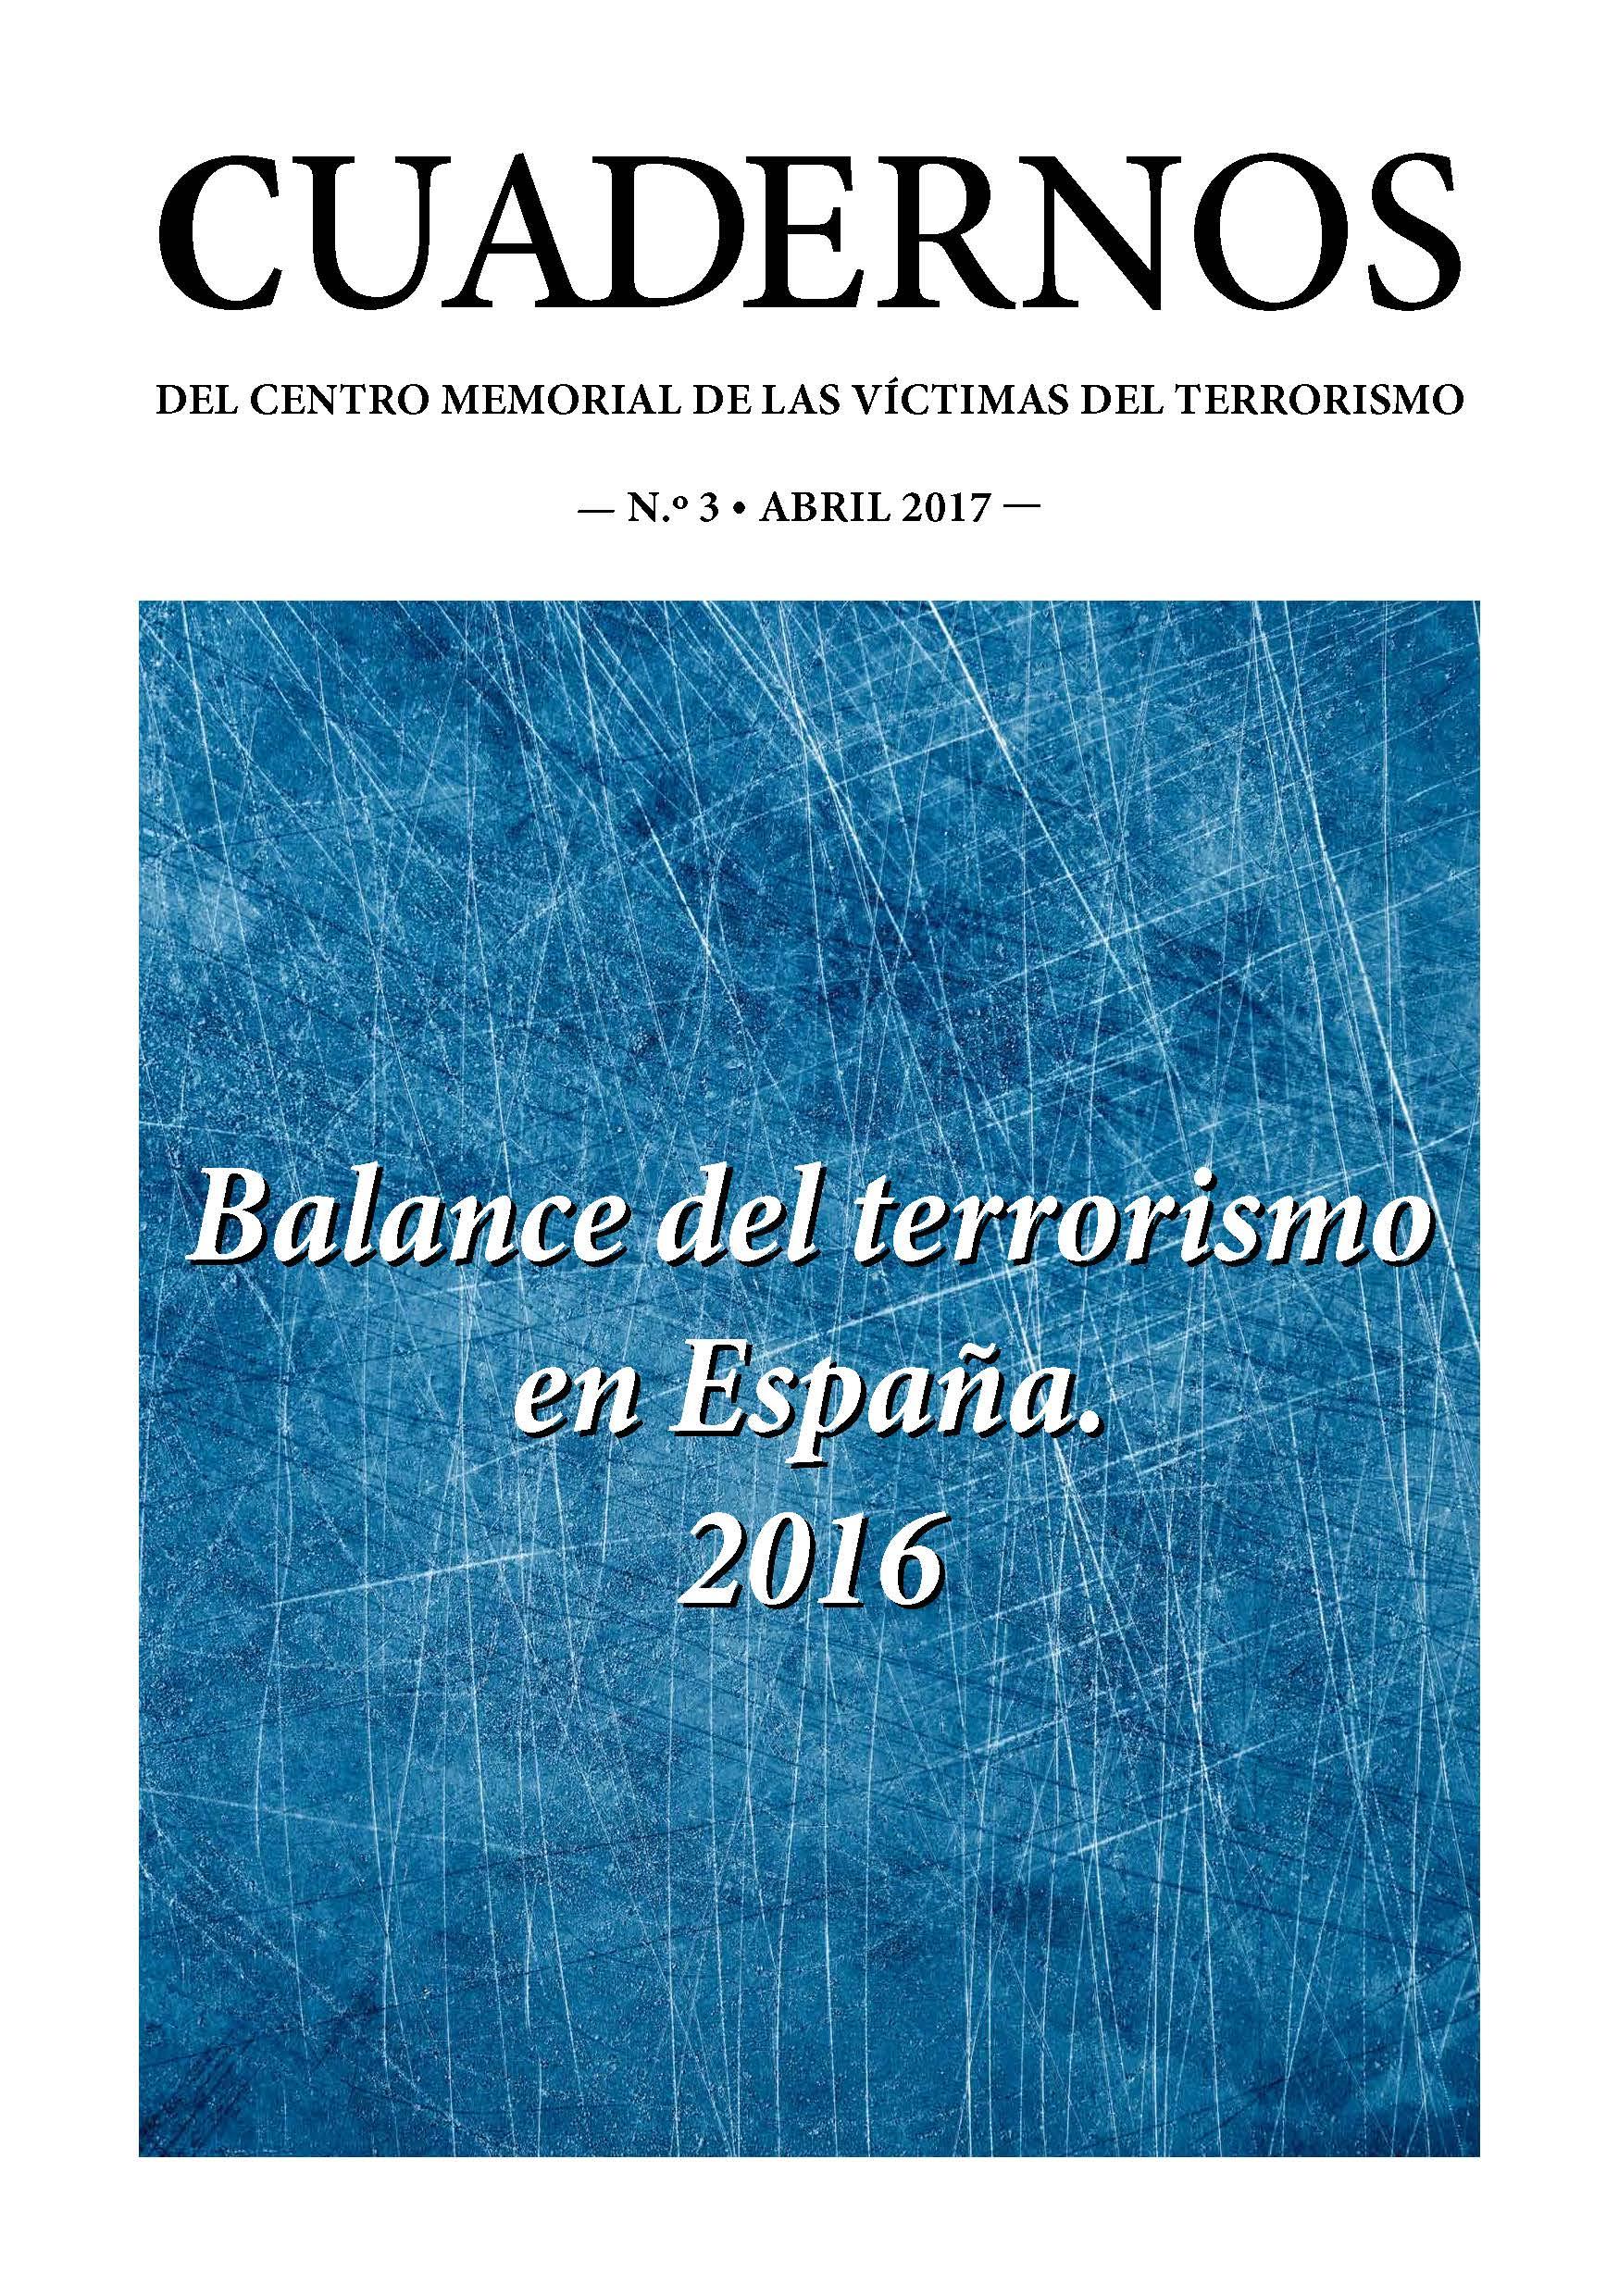 Balance del terrorismo en España. 2016